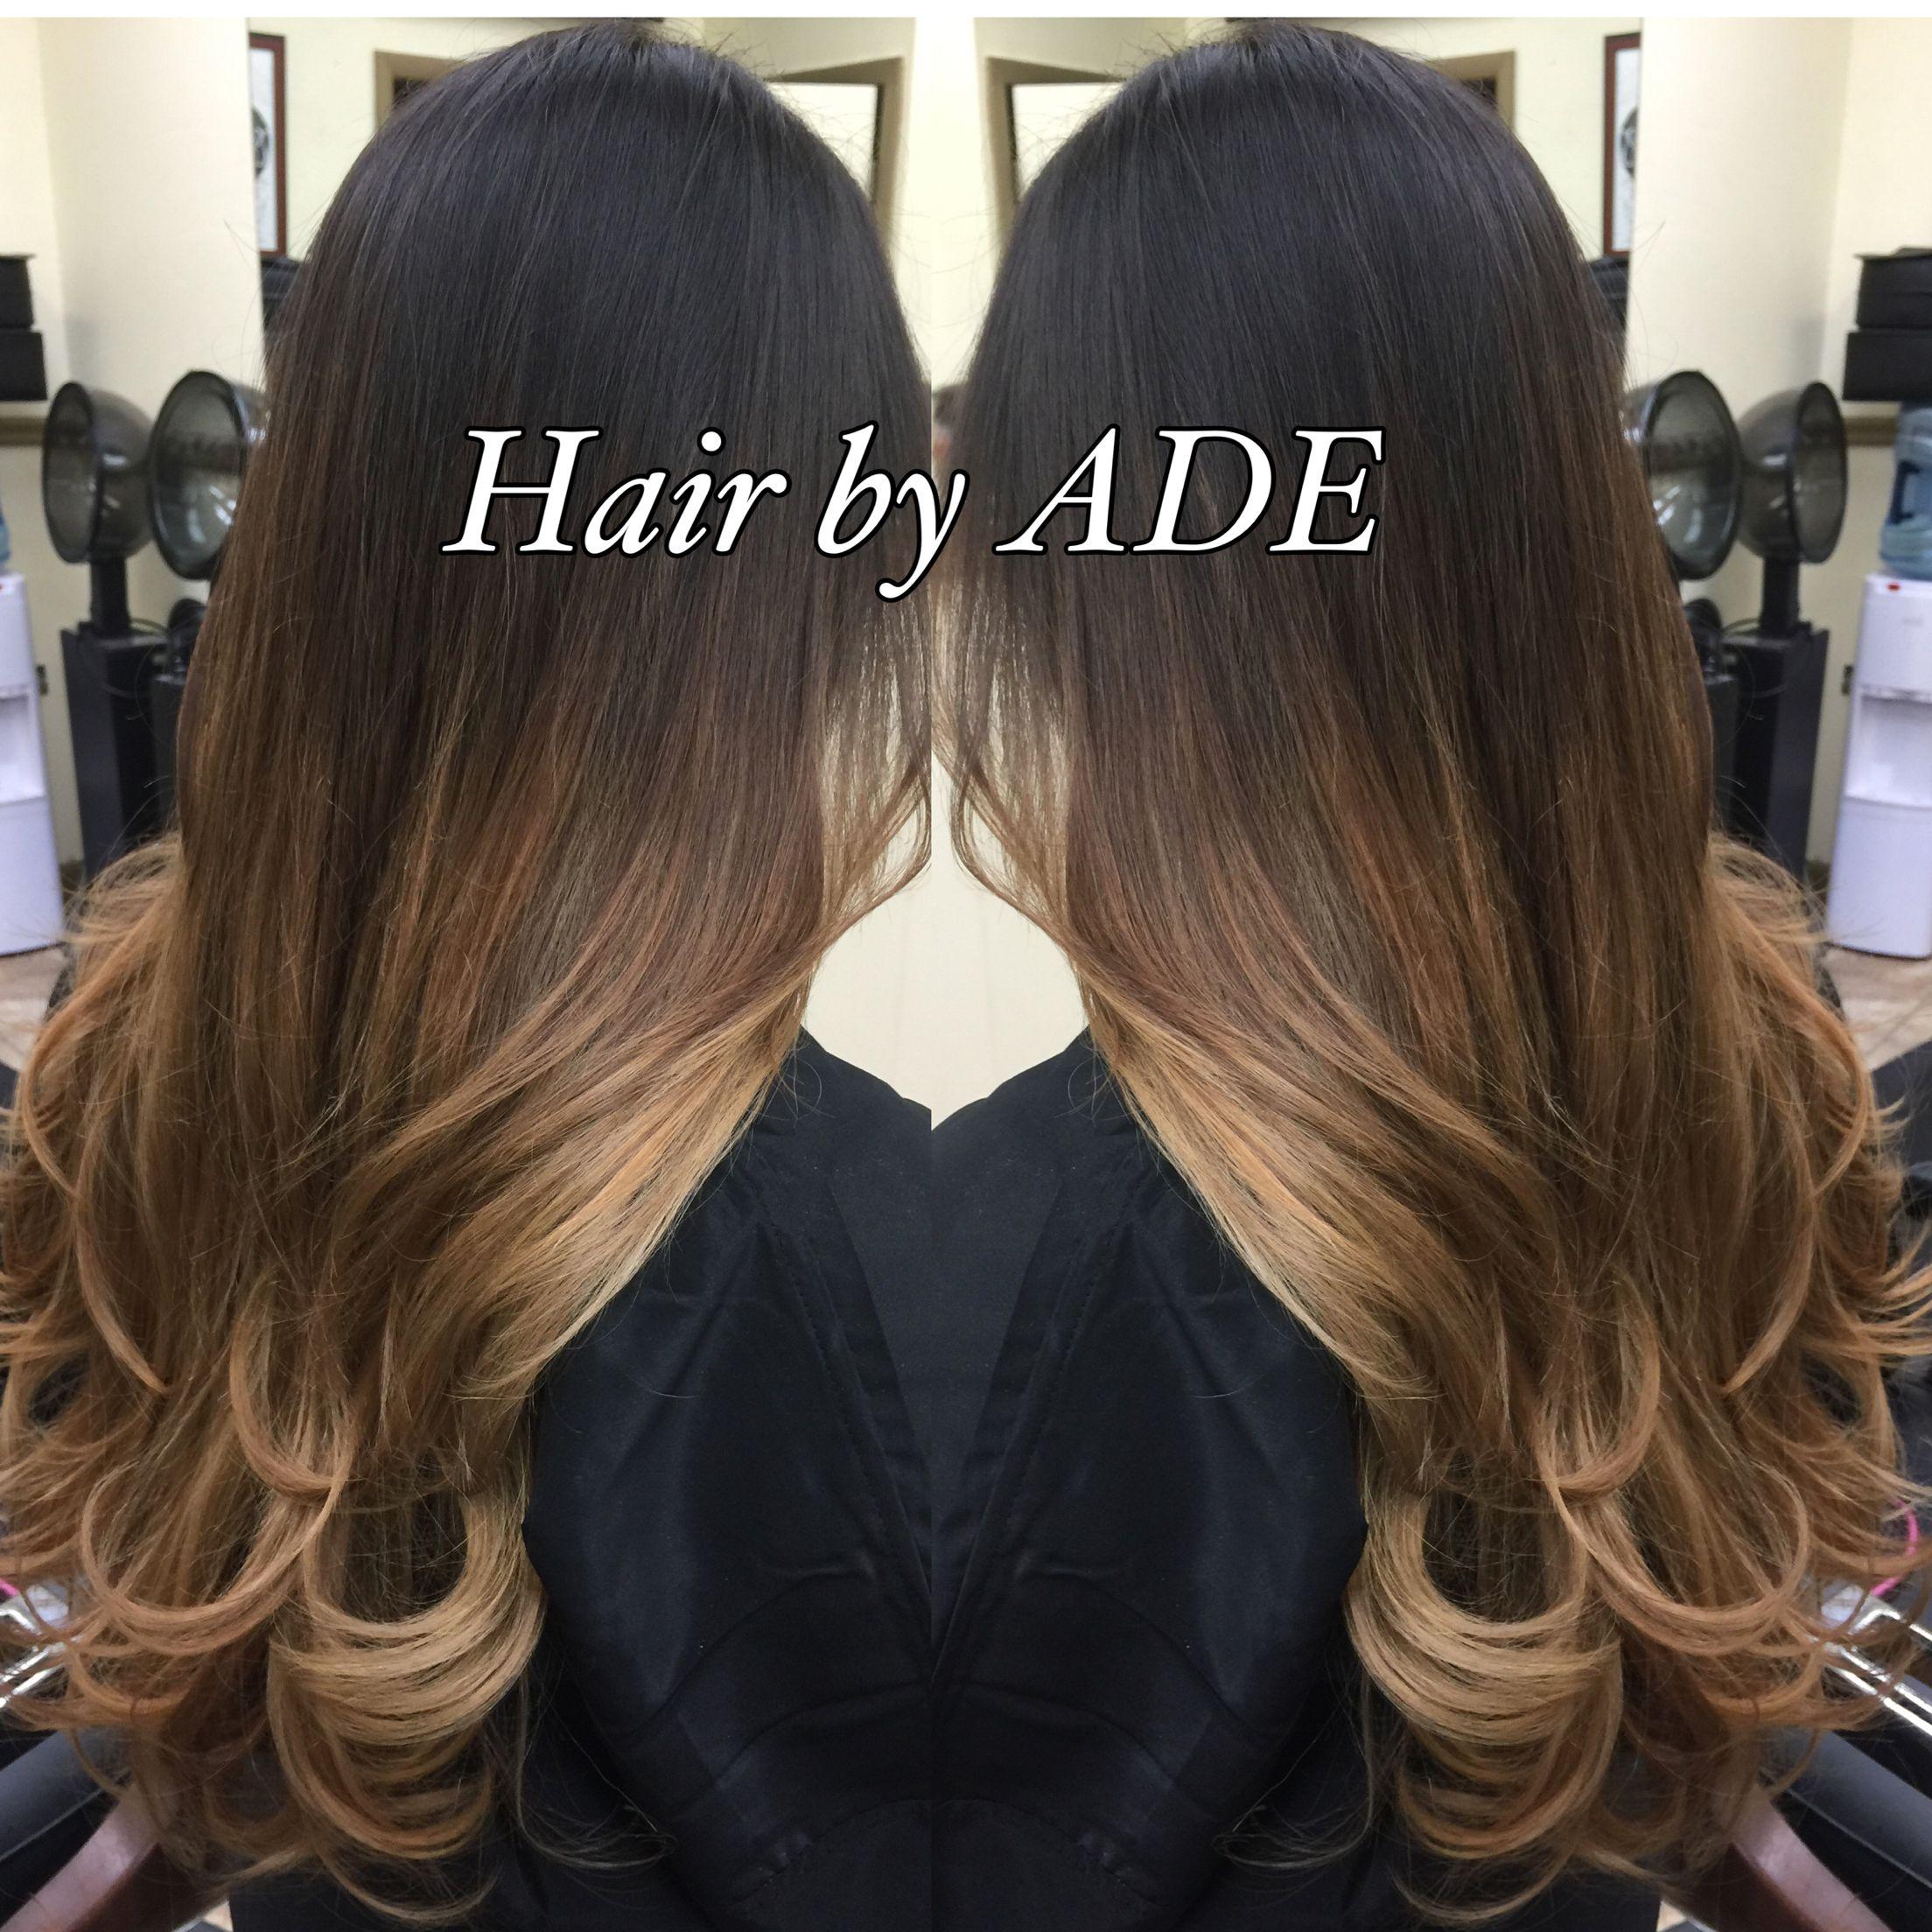 Kutter Millhopper Gainesville Fl 352 378 0239 Hair Design By Ade Long Hair Styles Hair Designs